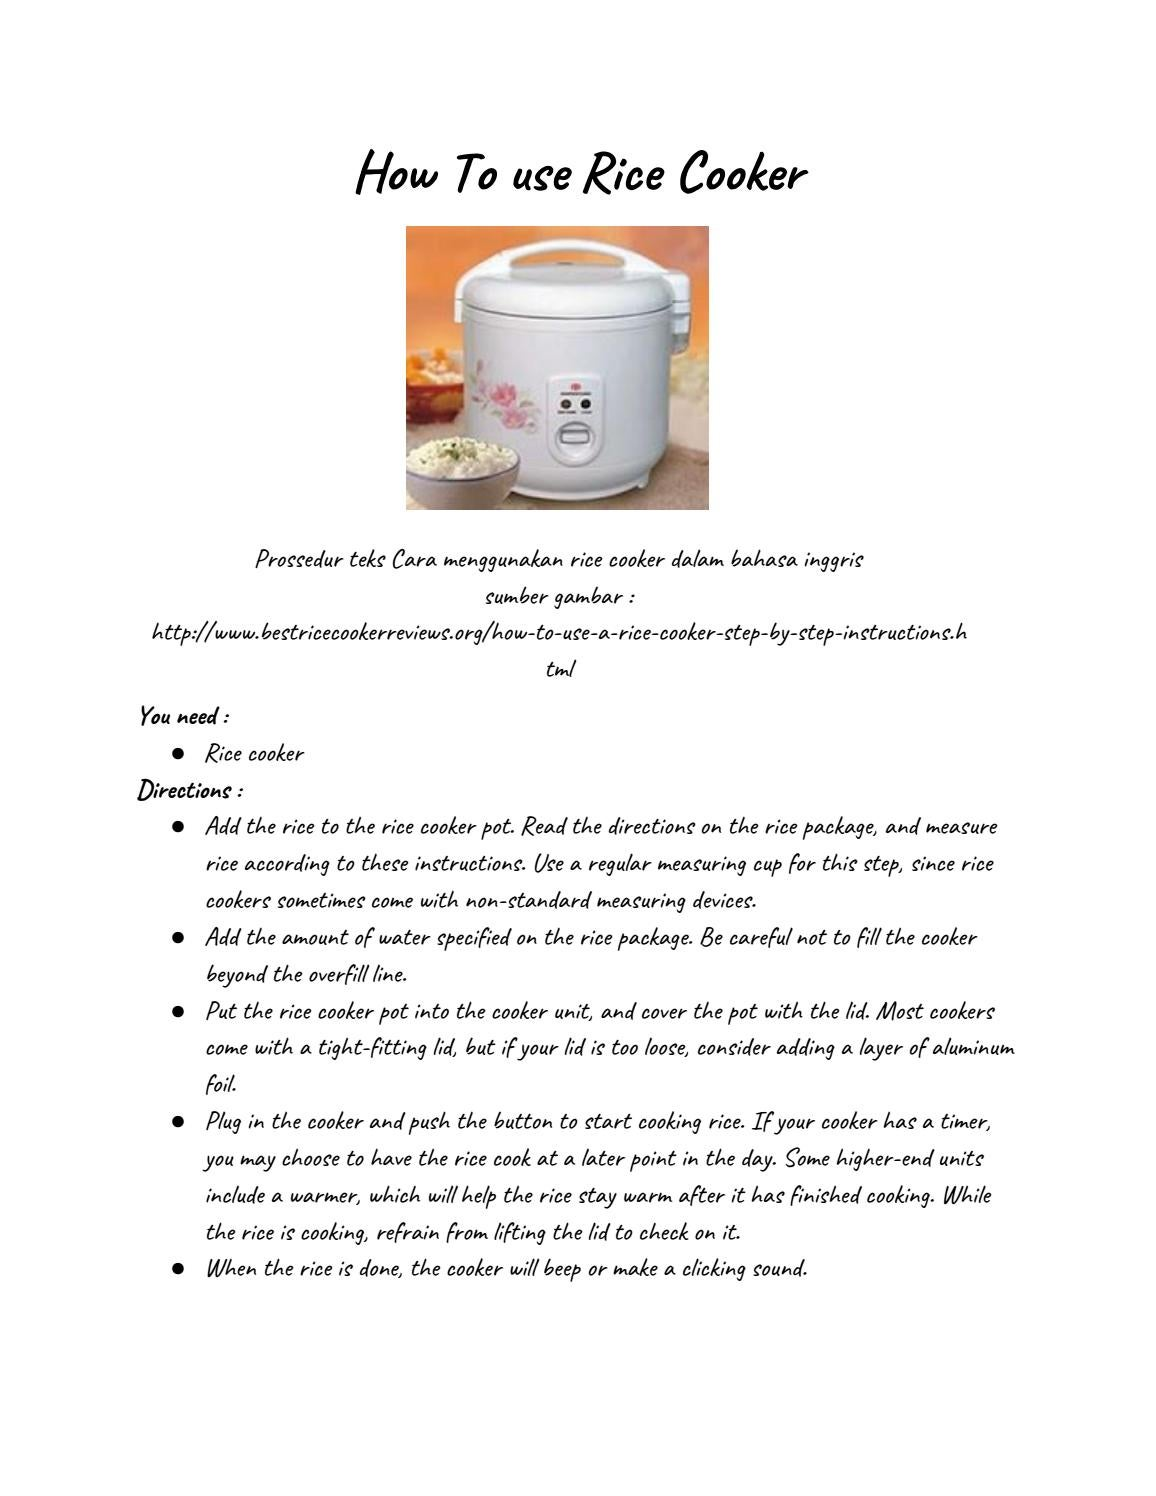 How To Use Rice Cooker By Shirleybkimbler Issuu